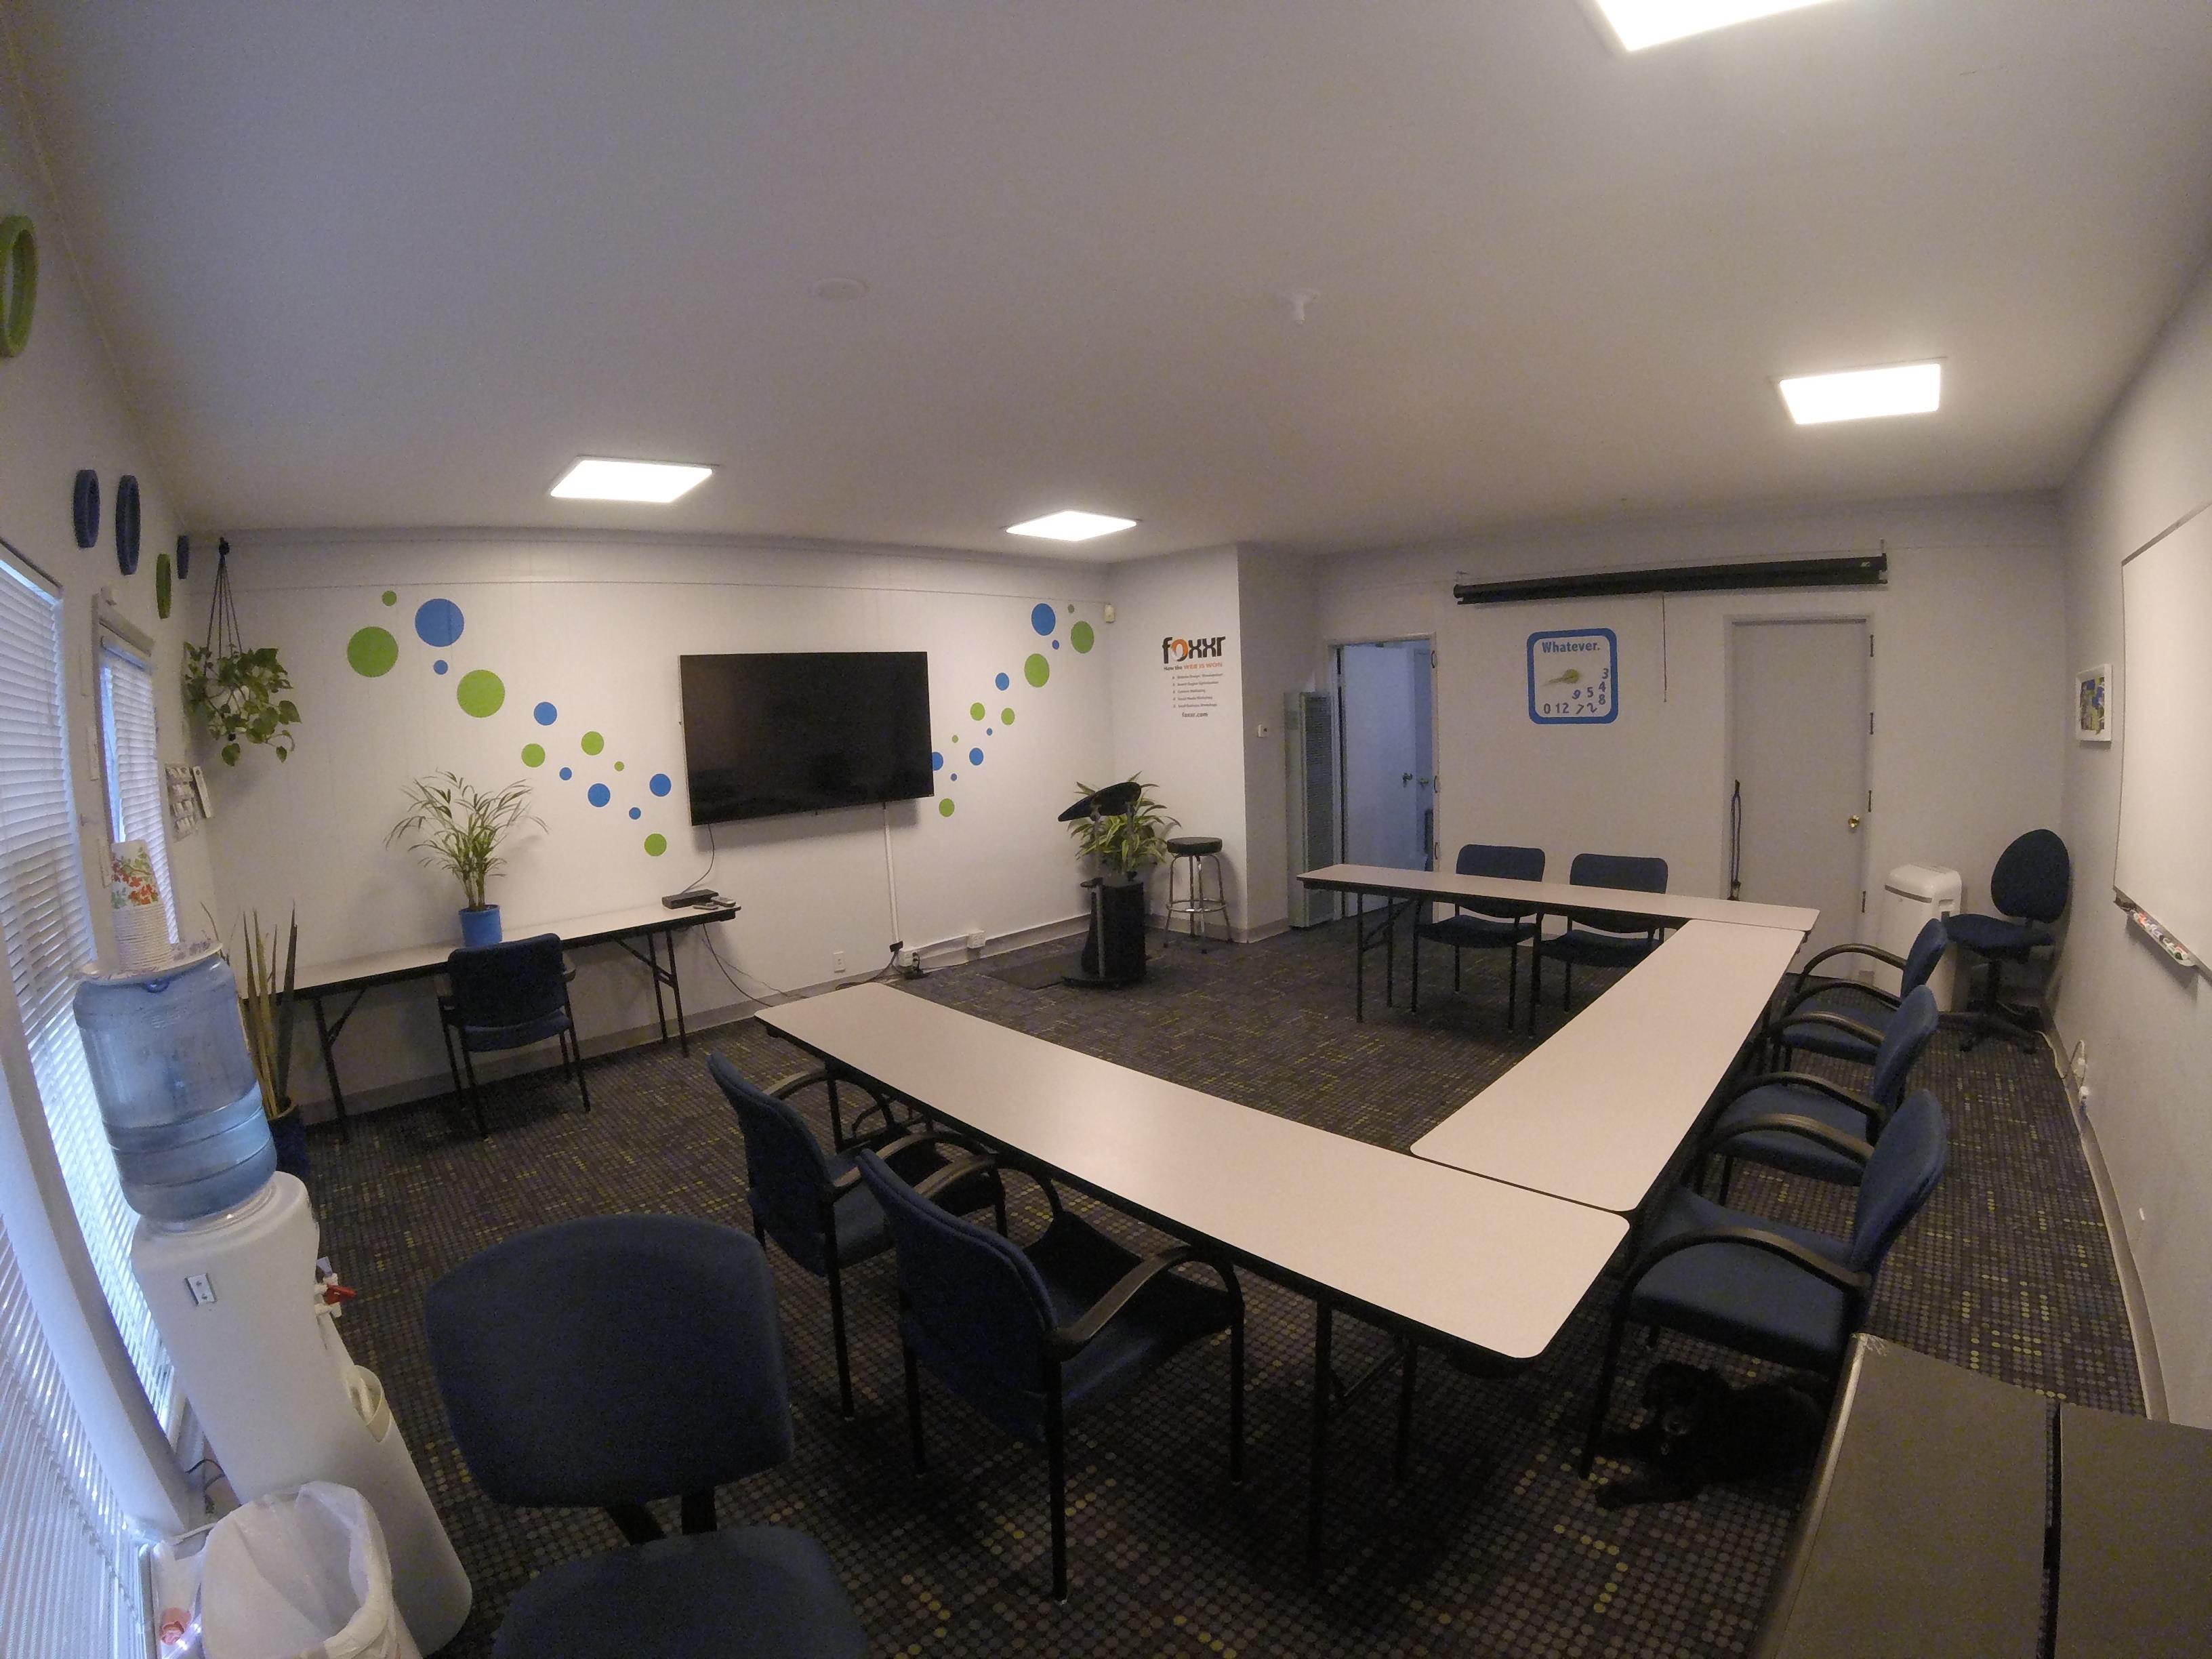 Foxxr - Capitola Conference Room